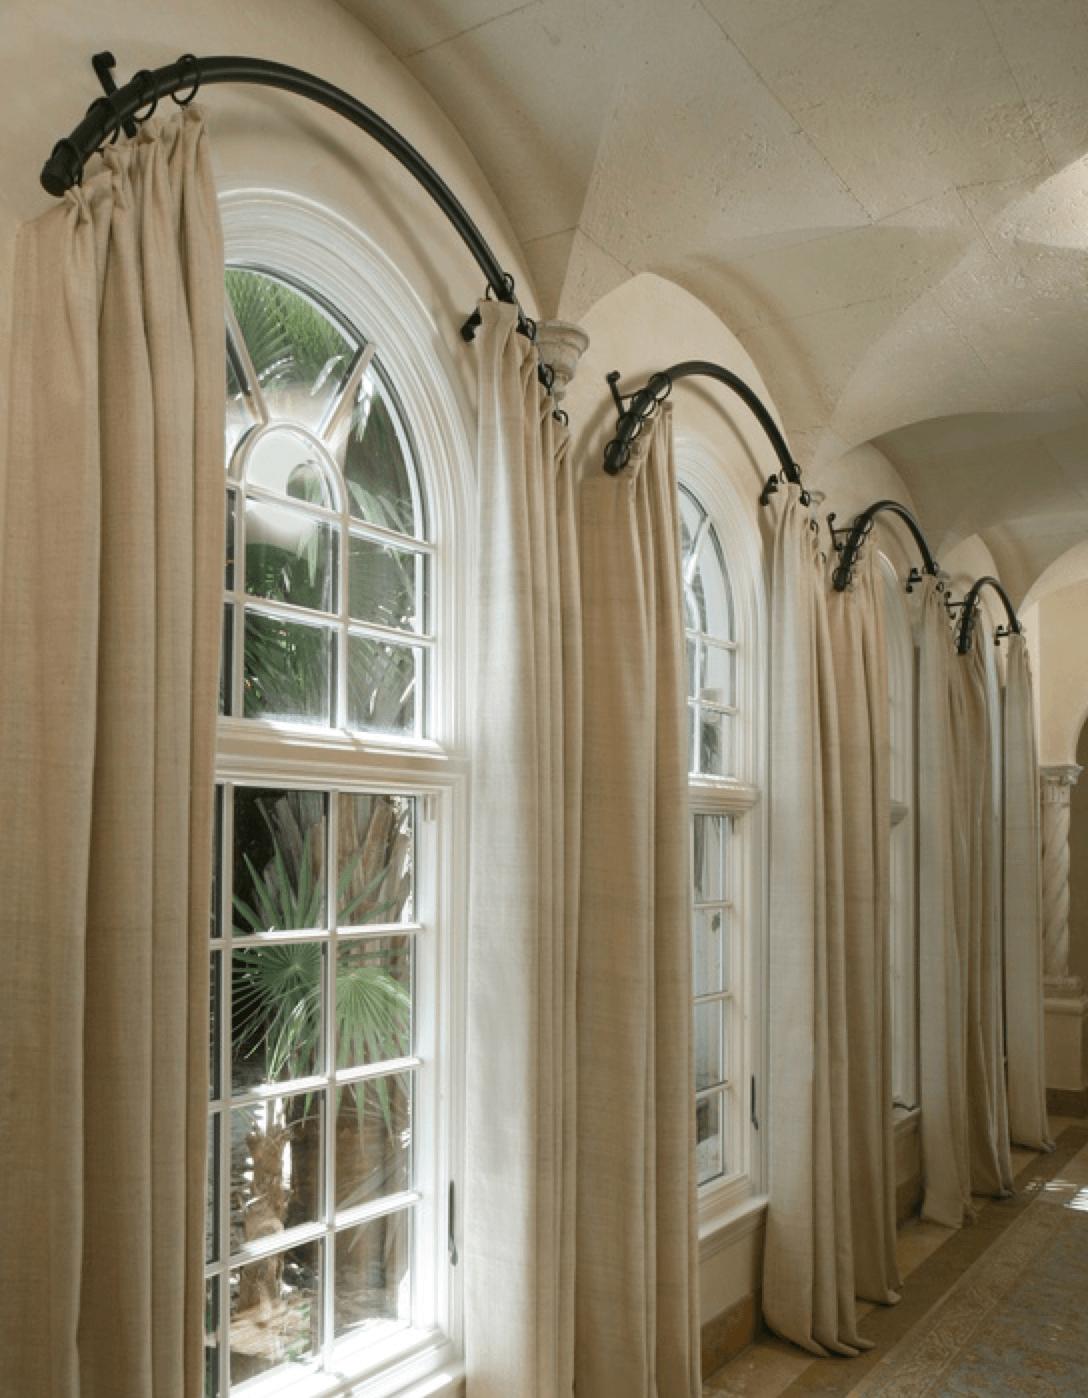 Гардины на арочных окнах